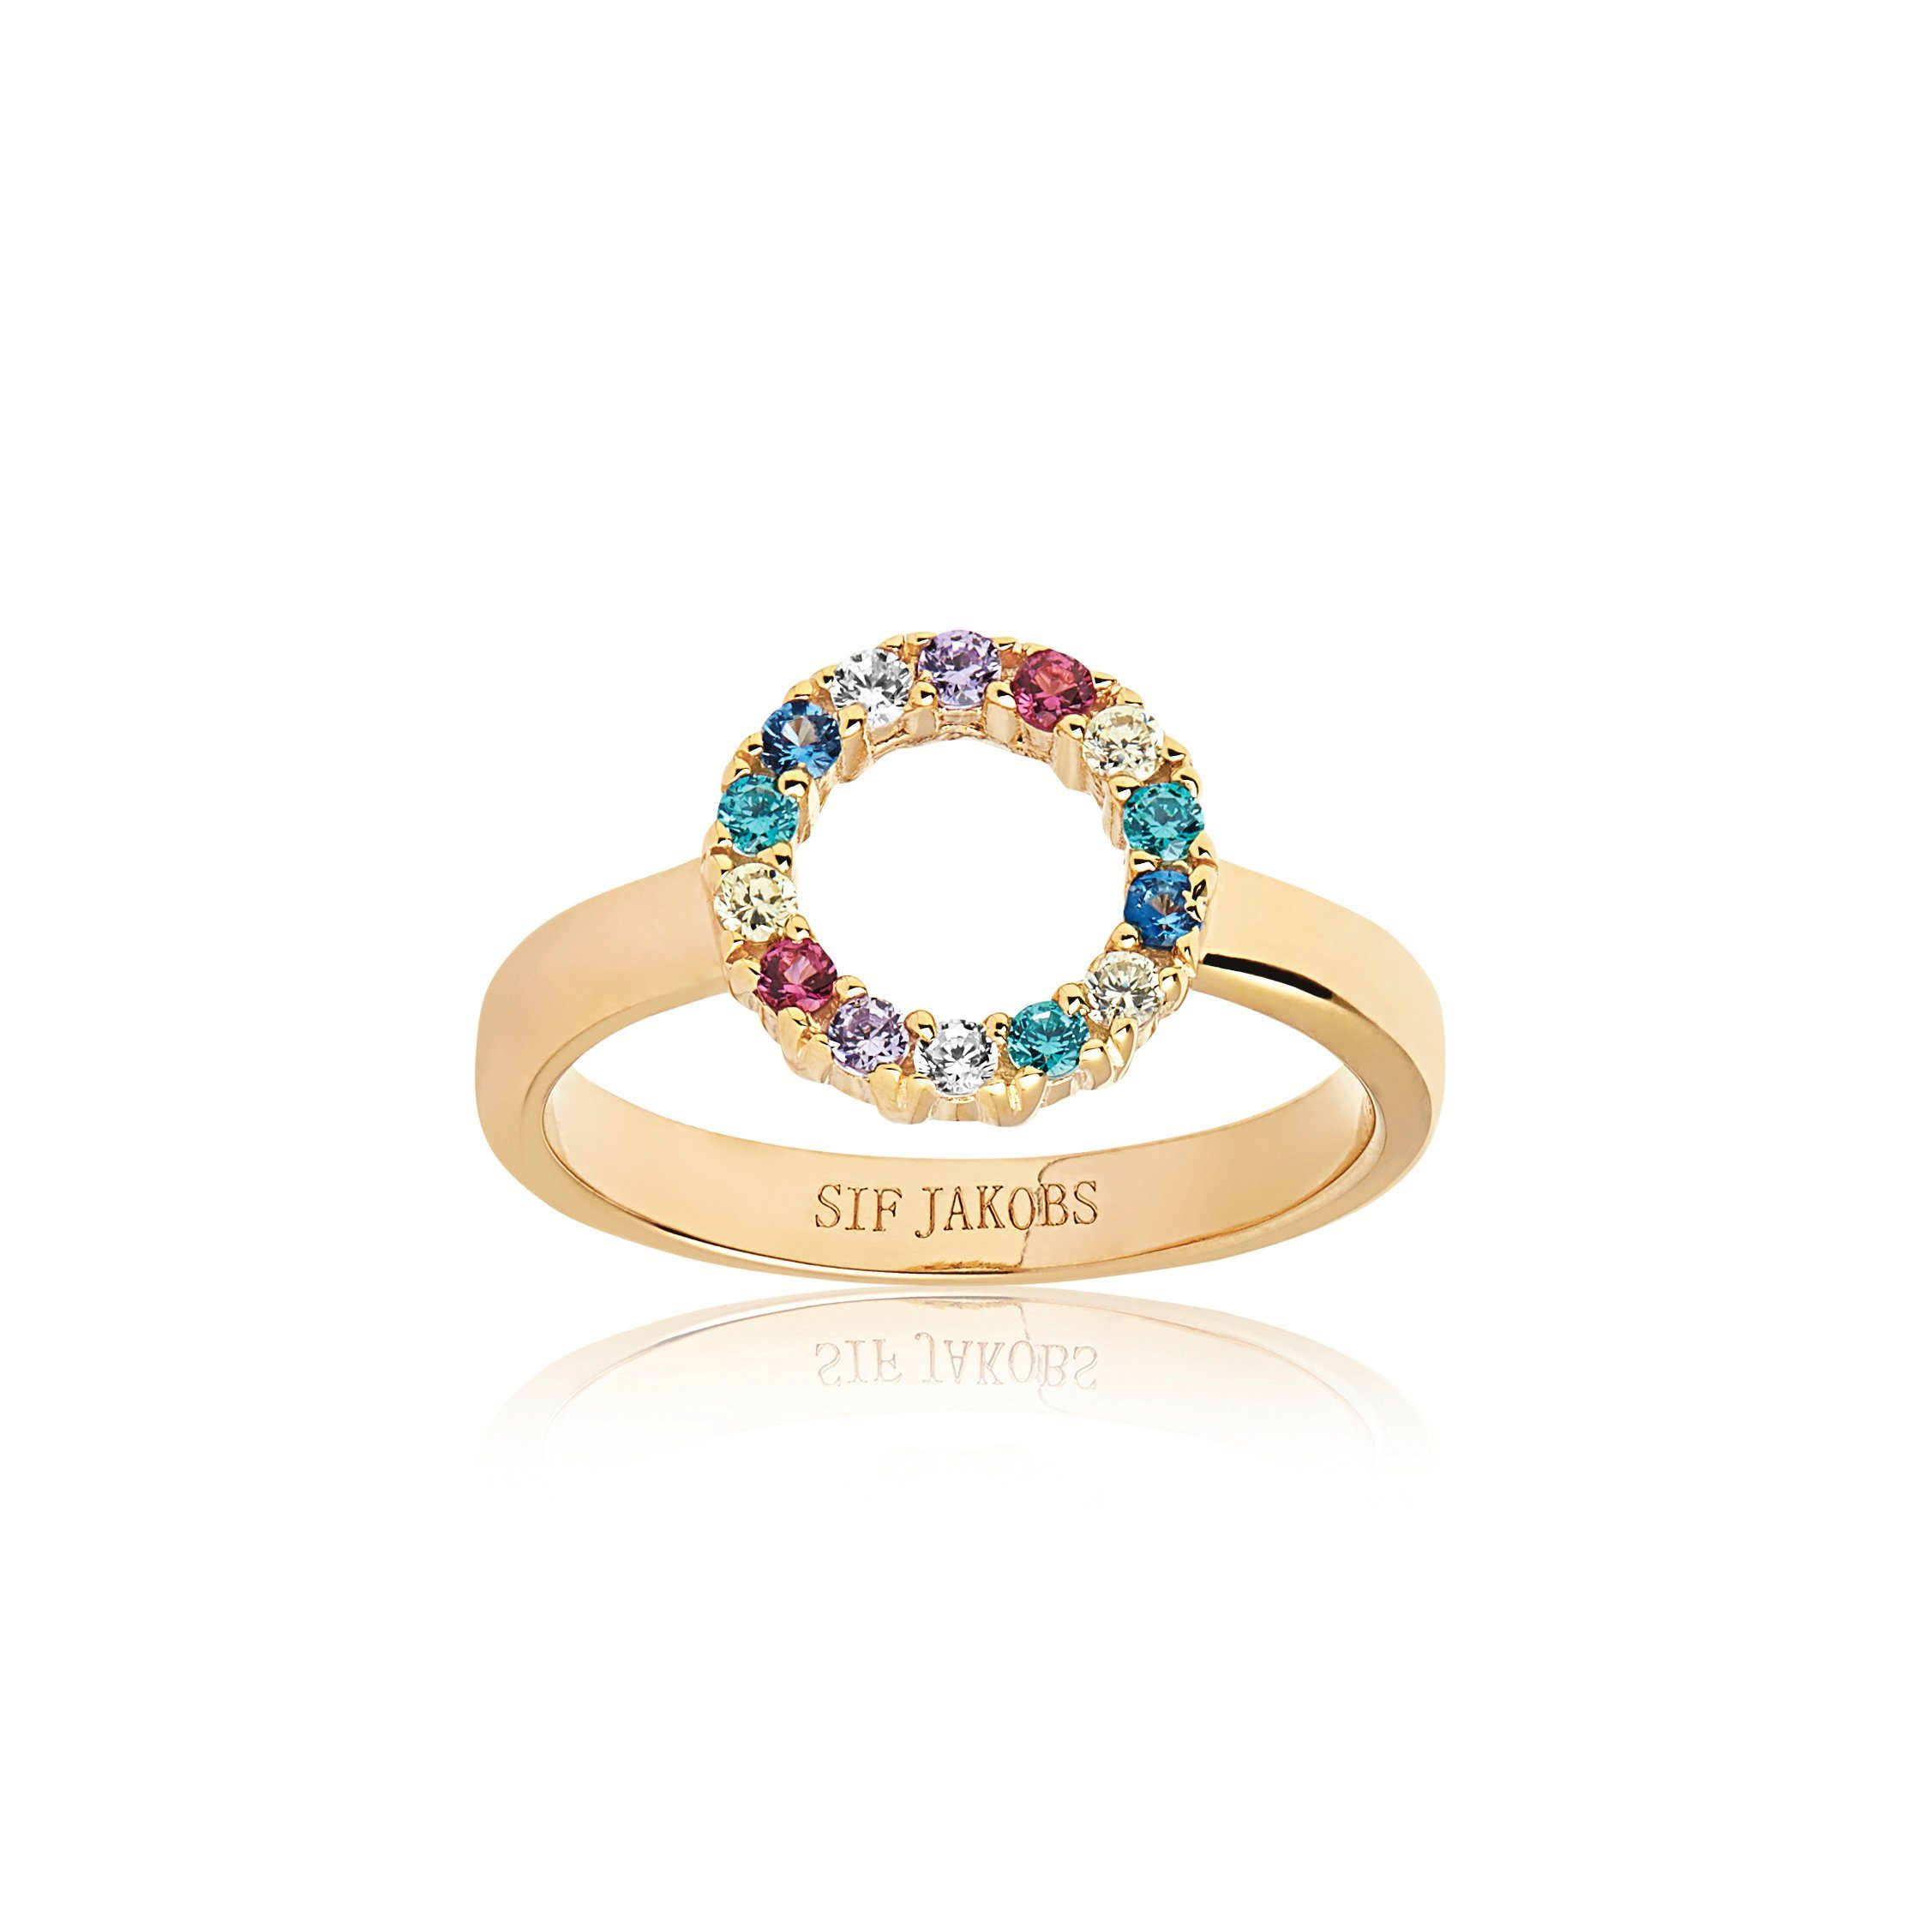 Sif Jakobs Jewellery Ring mit bunten Zirkonia Steinen online kaufen   OTTO